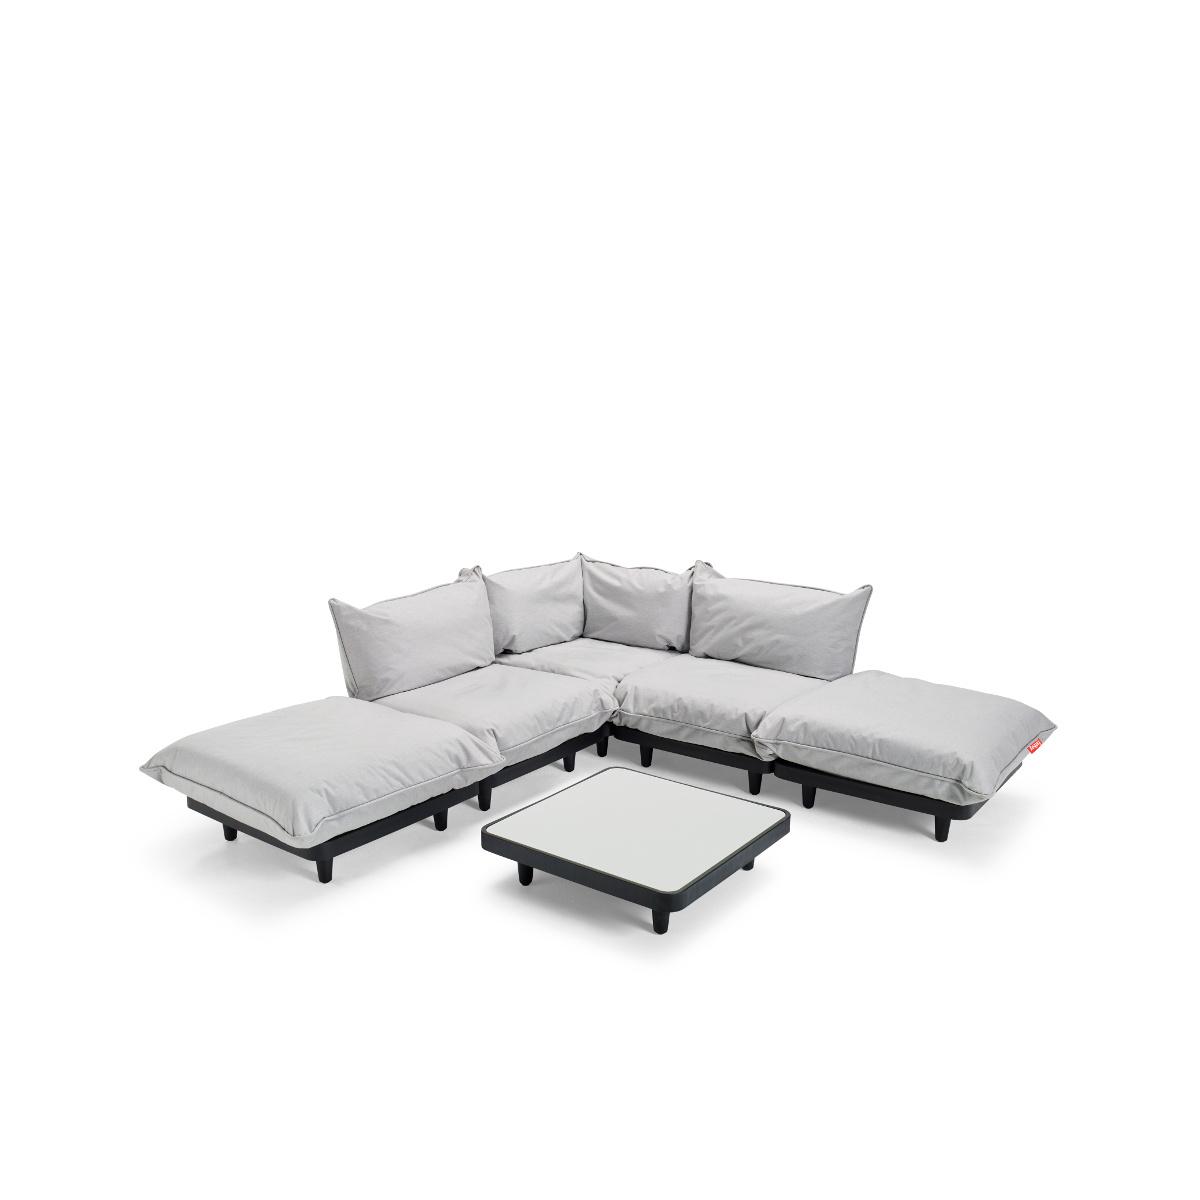 FATBOY Lounge